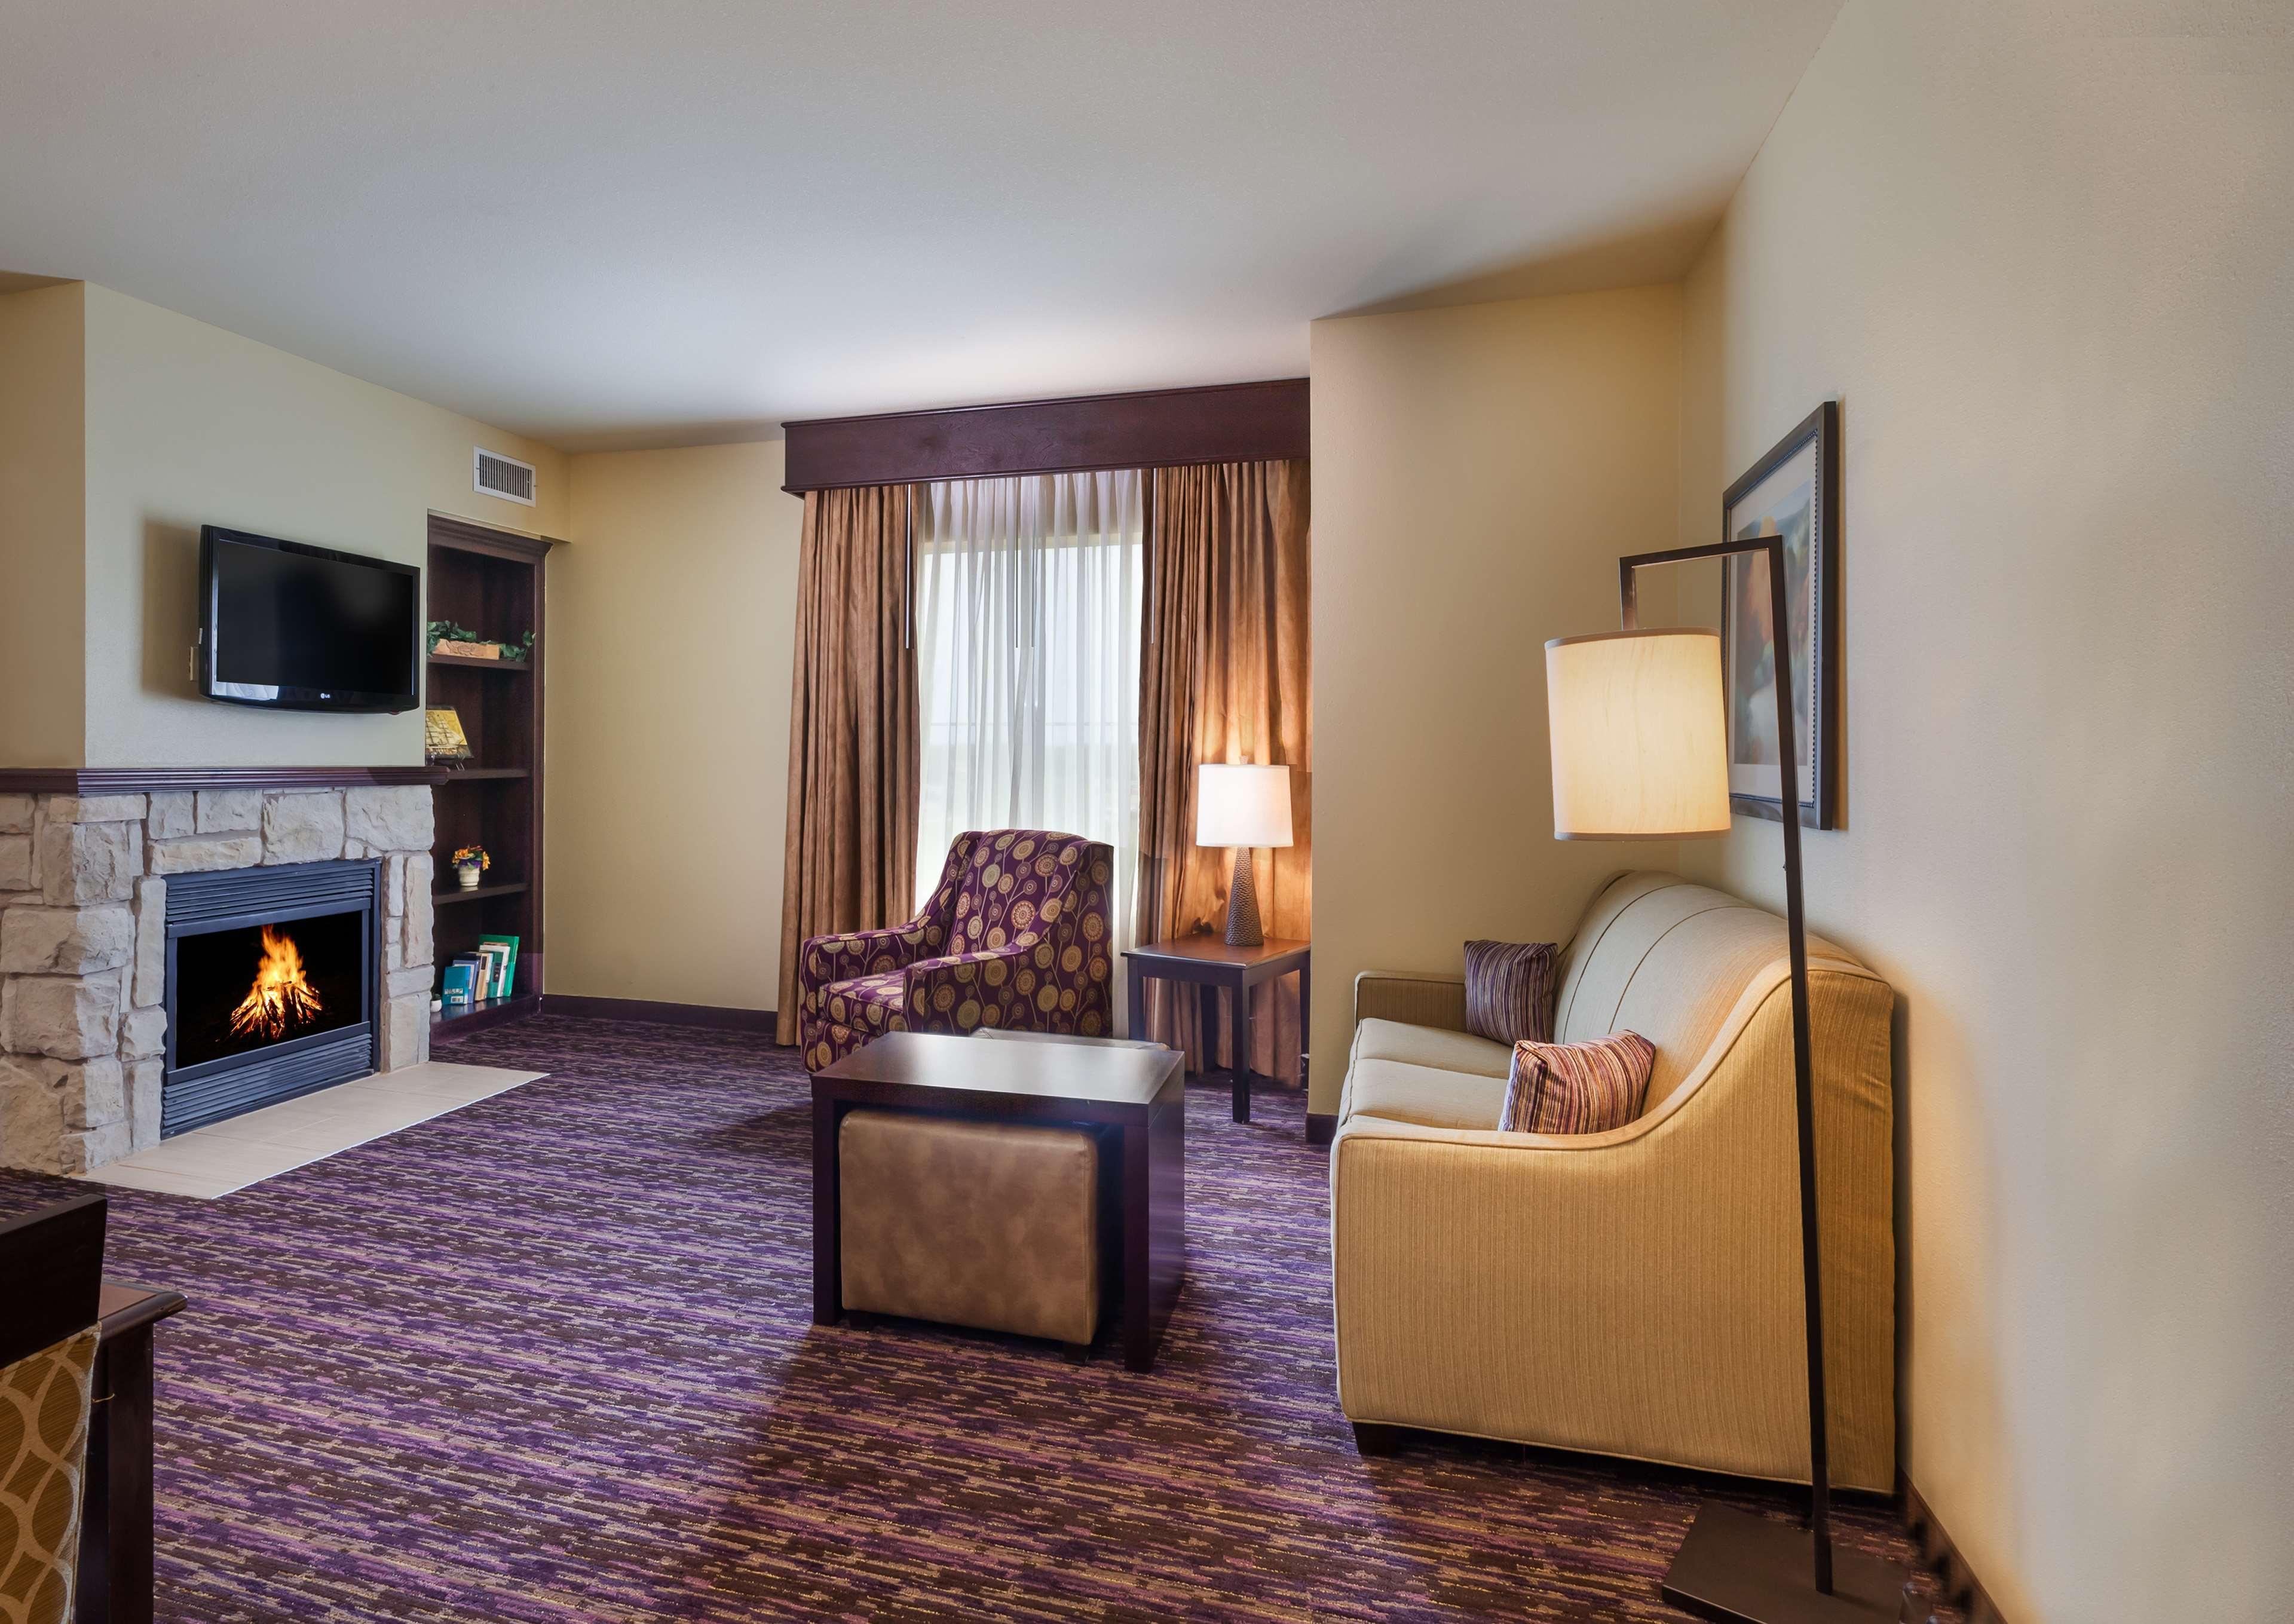 Homewood Suites by Hilton Wichita Falls image 21